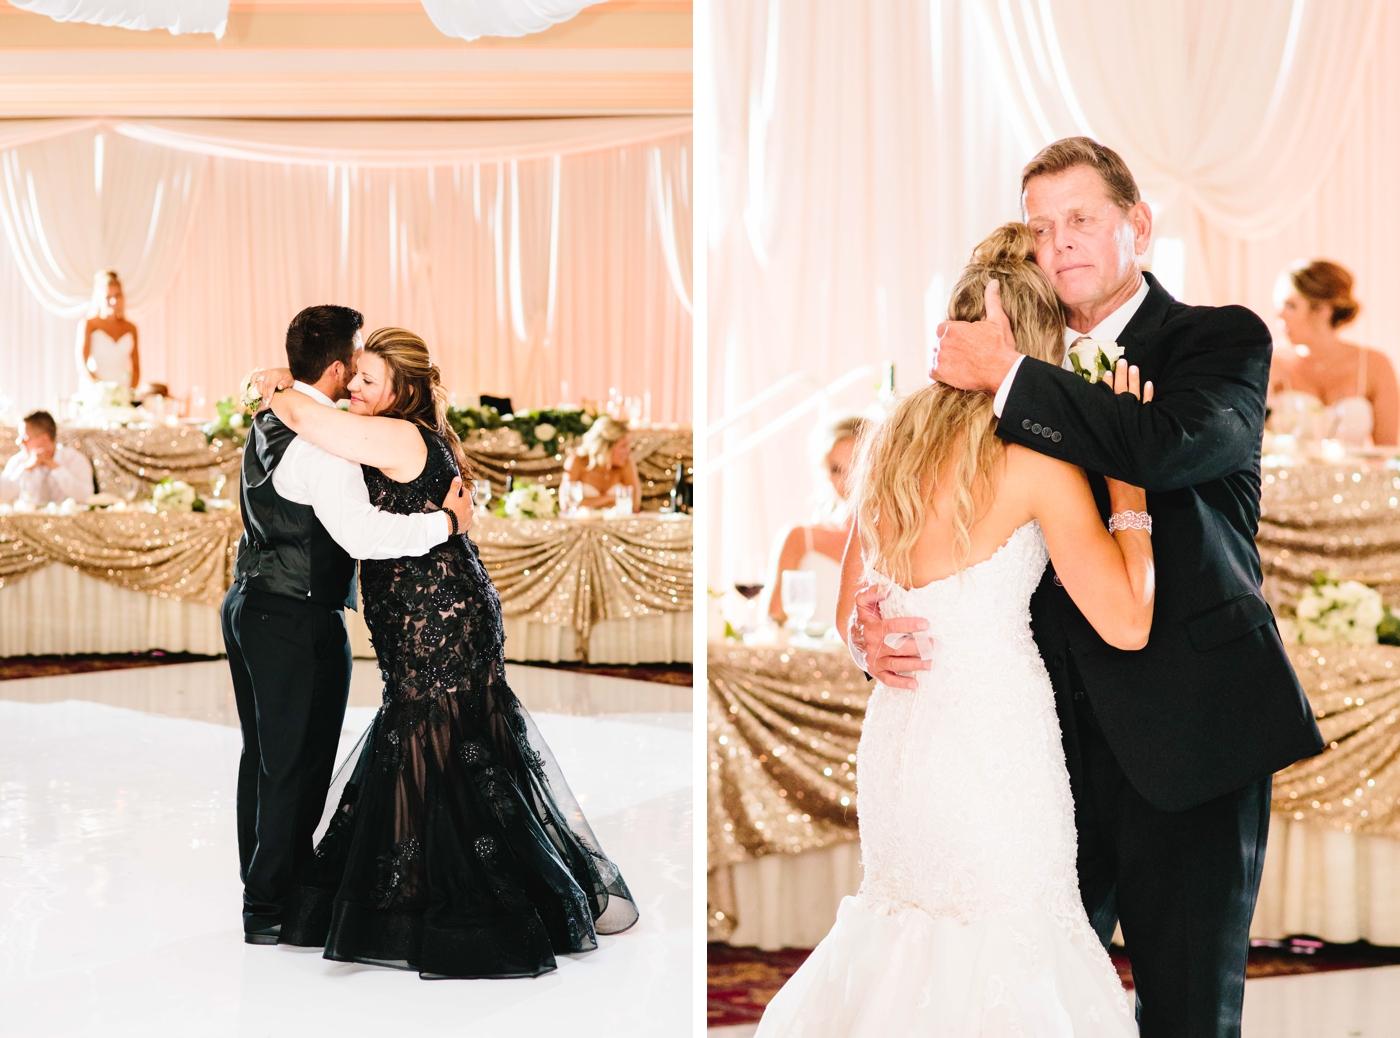 chicago-fine-art-wedding-photography-patano48